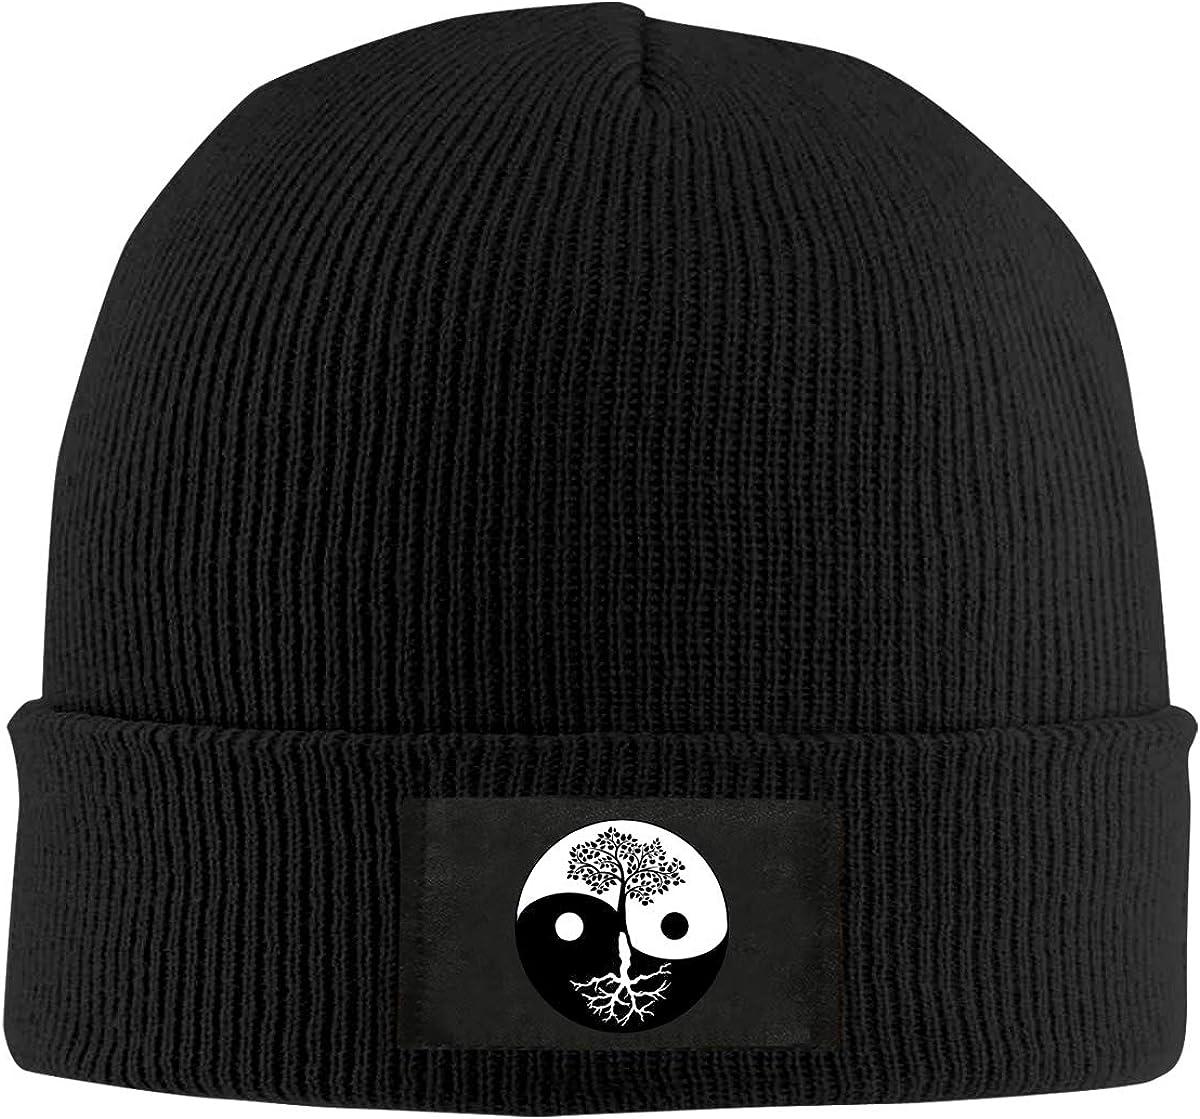 Unisex Stylish Slouch Beanie Hats Black Tree of Life Yin Yang Logo Top Level Beanie Men Women